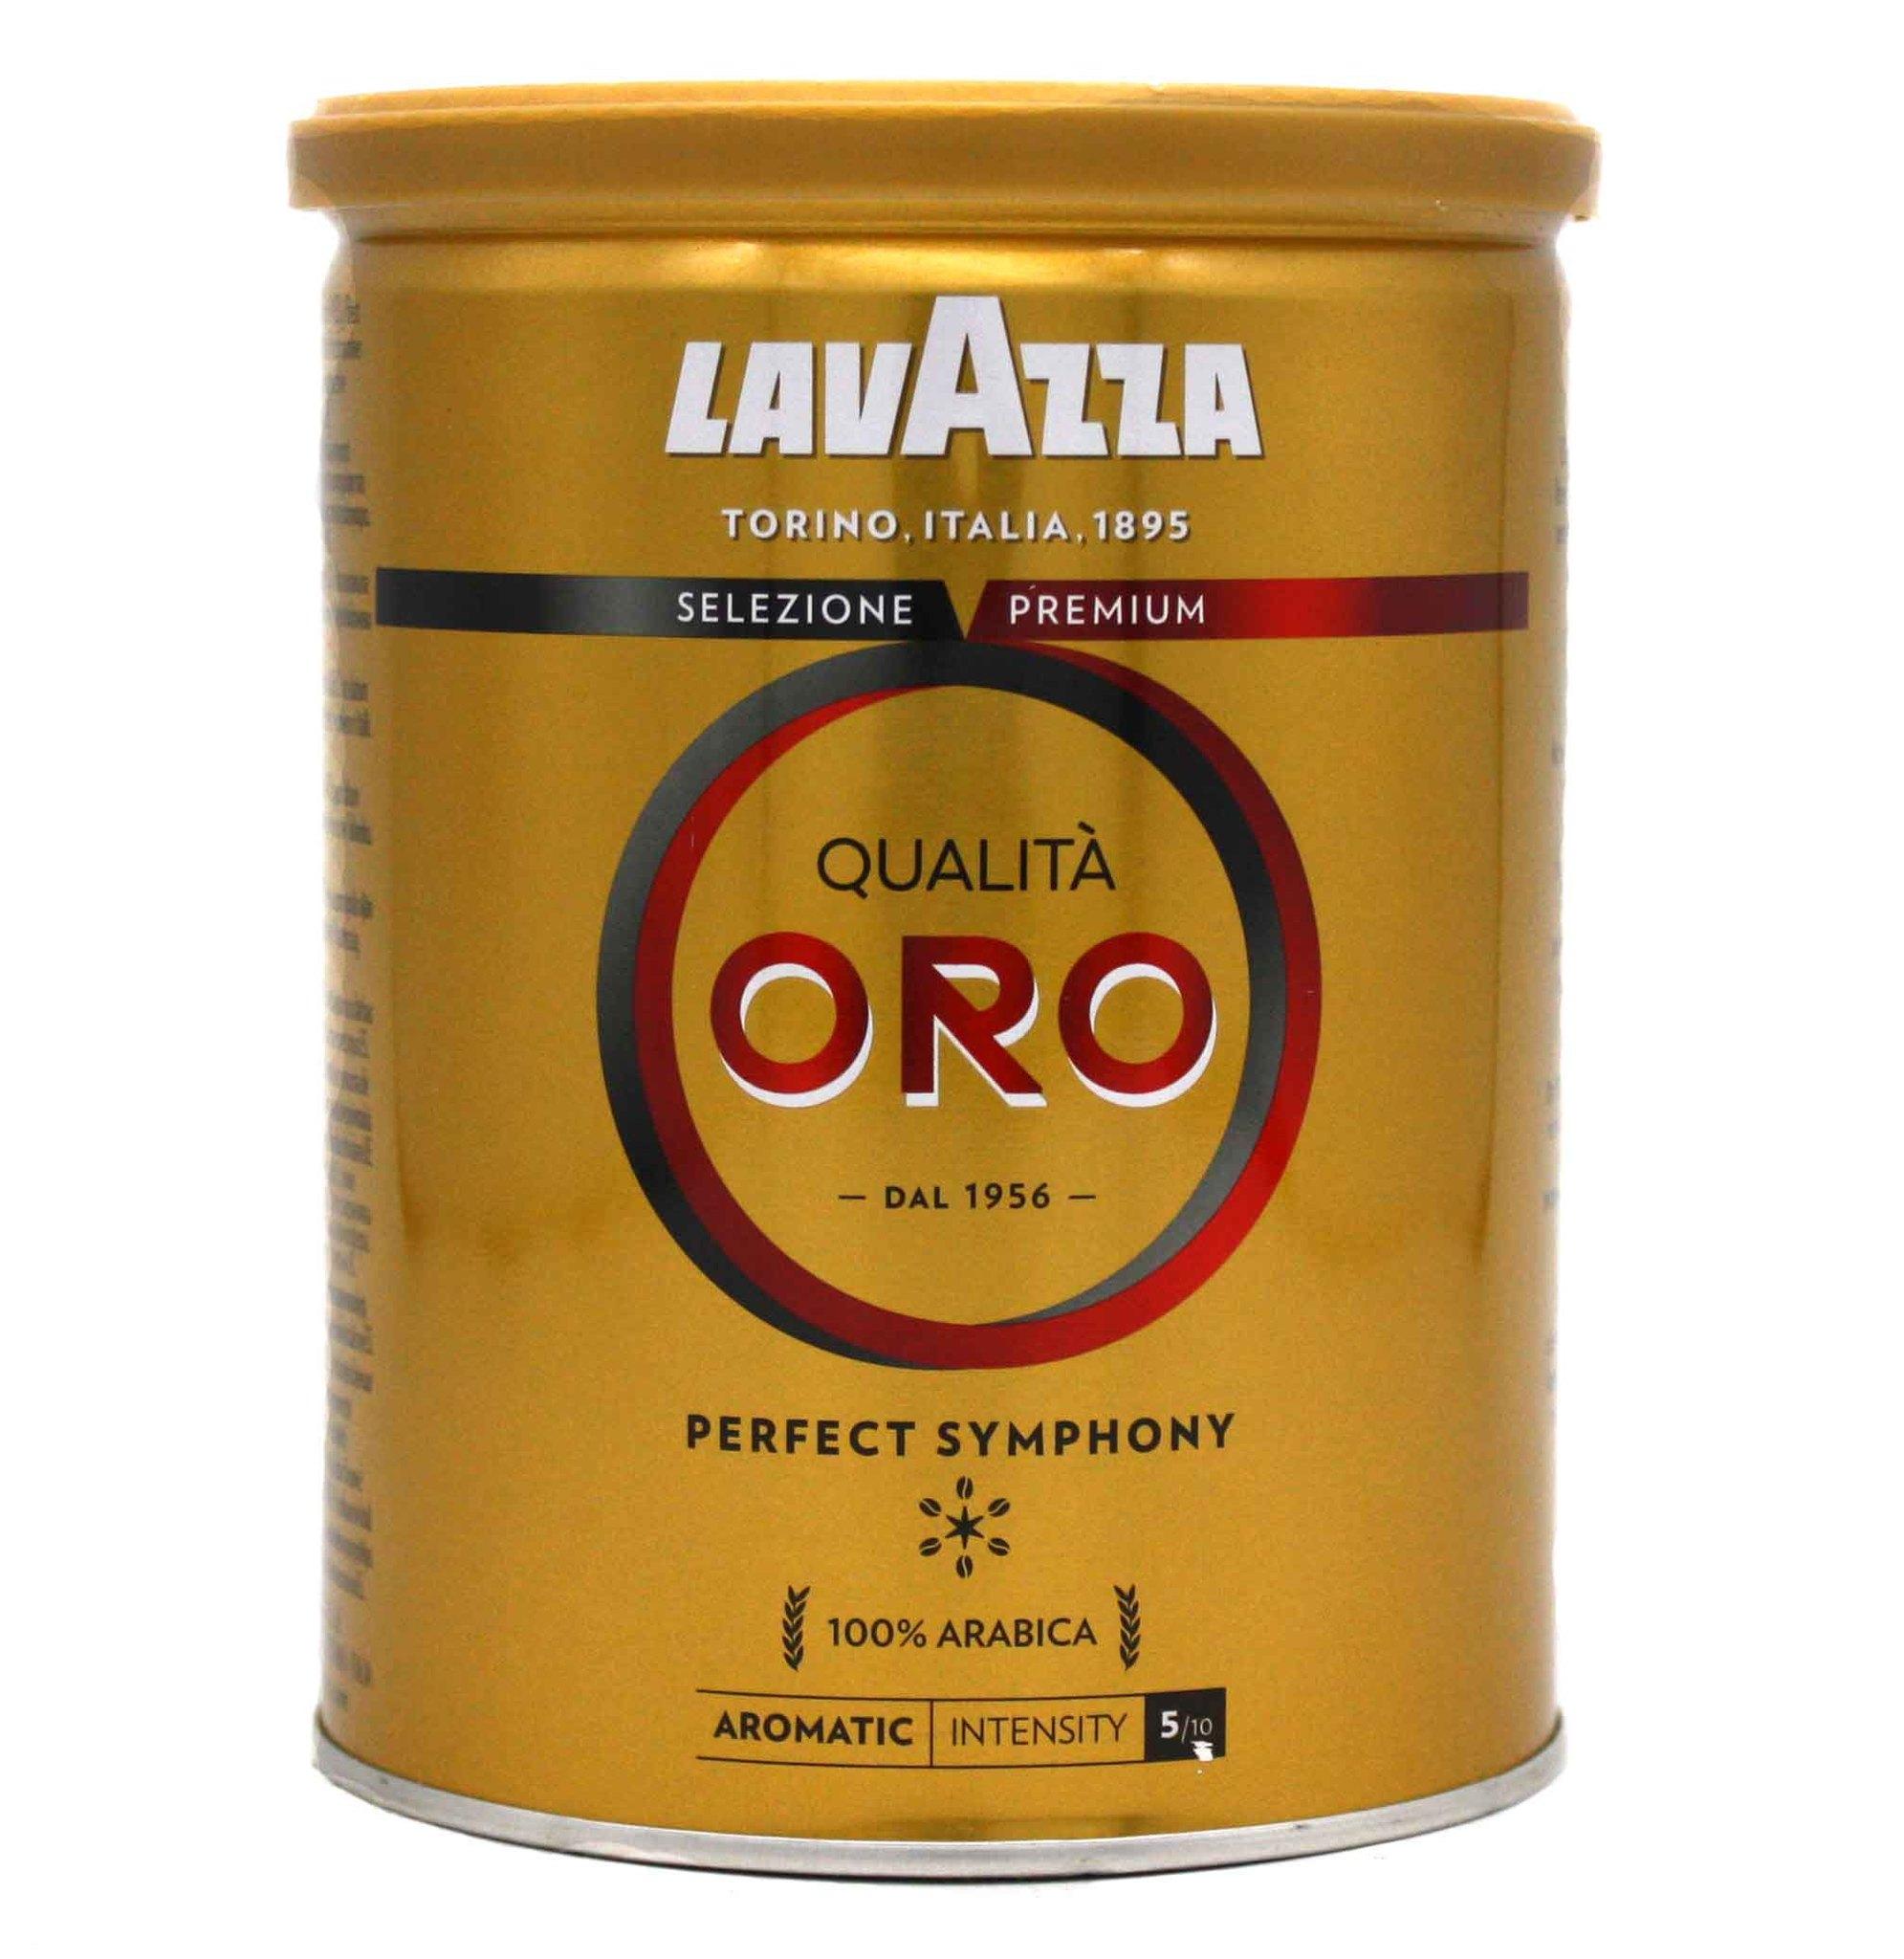 Кофе молотый Qualita Oro, Lavazza, 250 г import_files_71_7195d963ec2211eaa9d1484d7ecee297_4ff6a553eeba11eaa9d3484d7ecee297.jpg